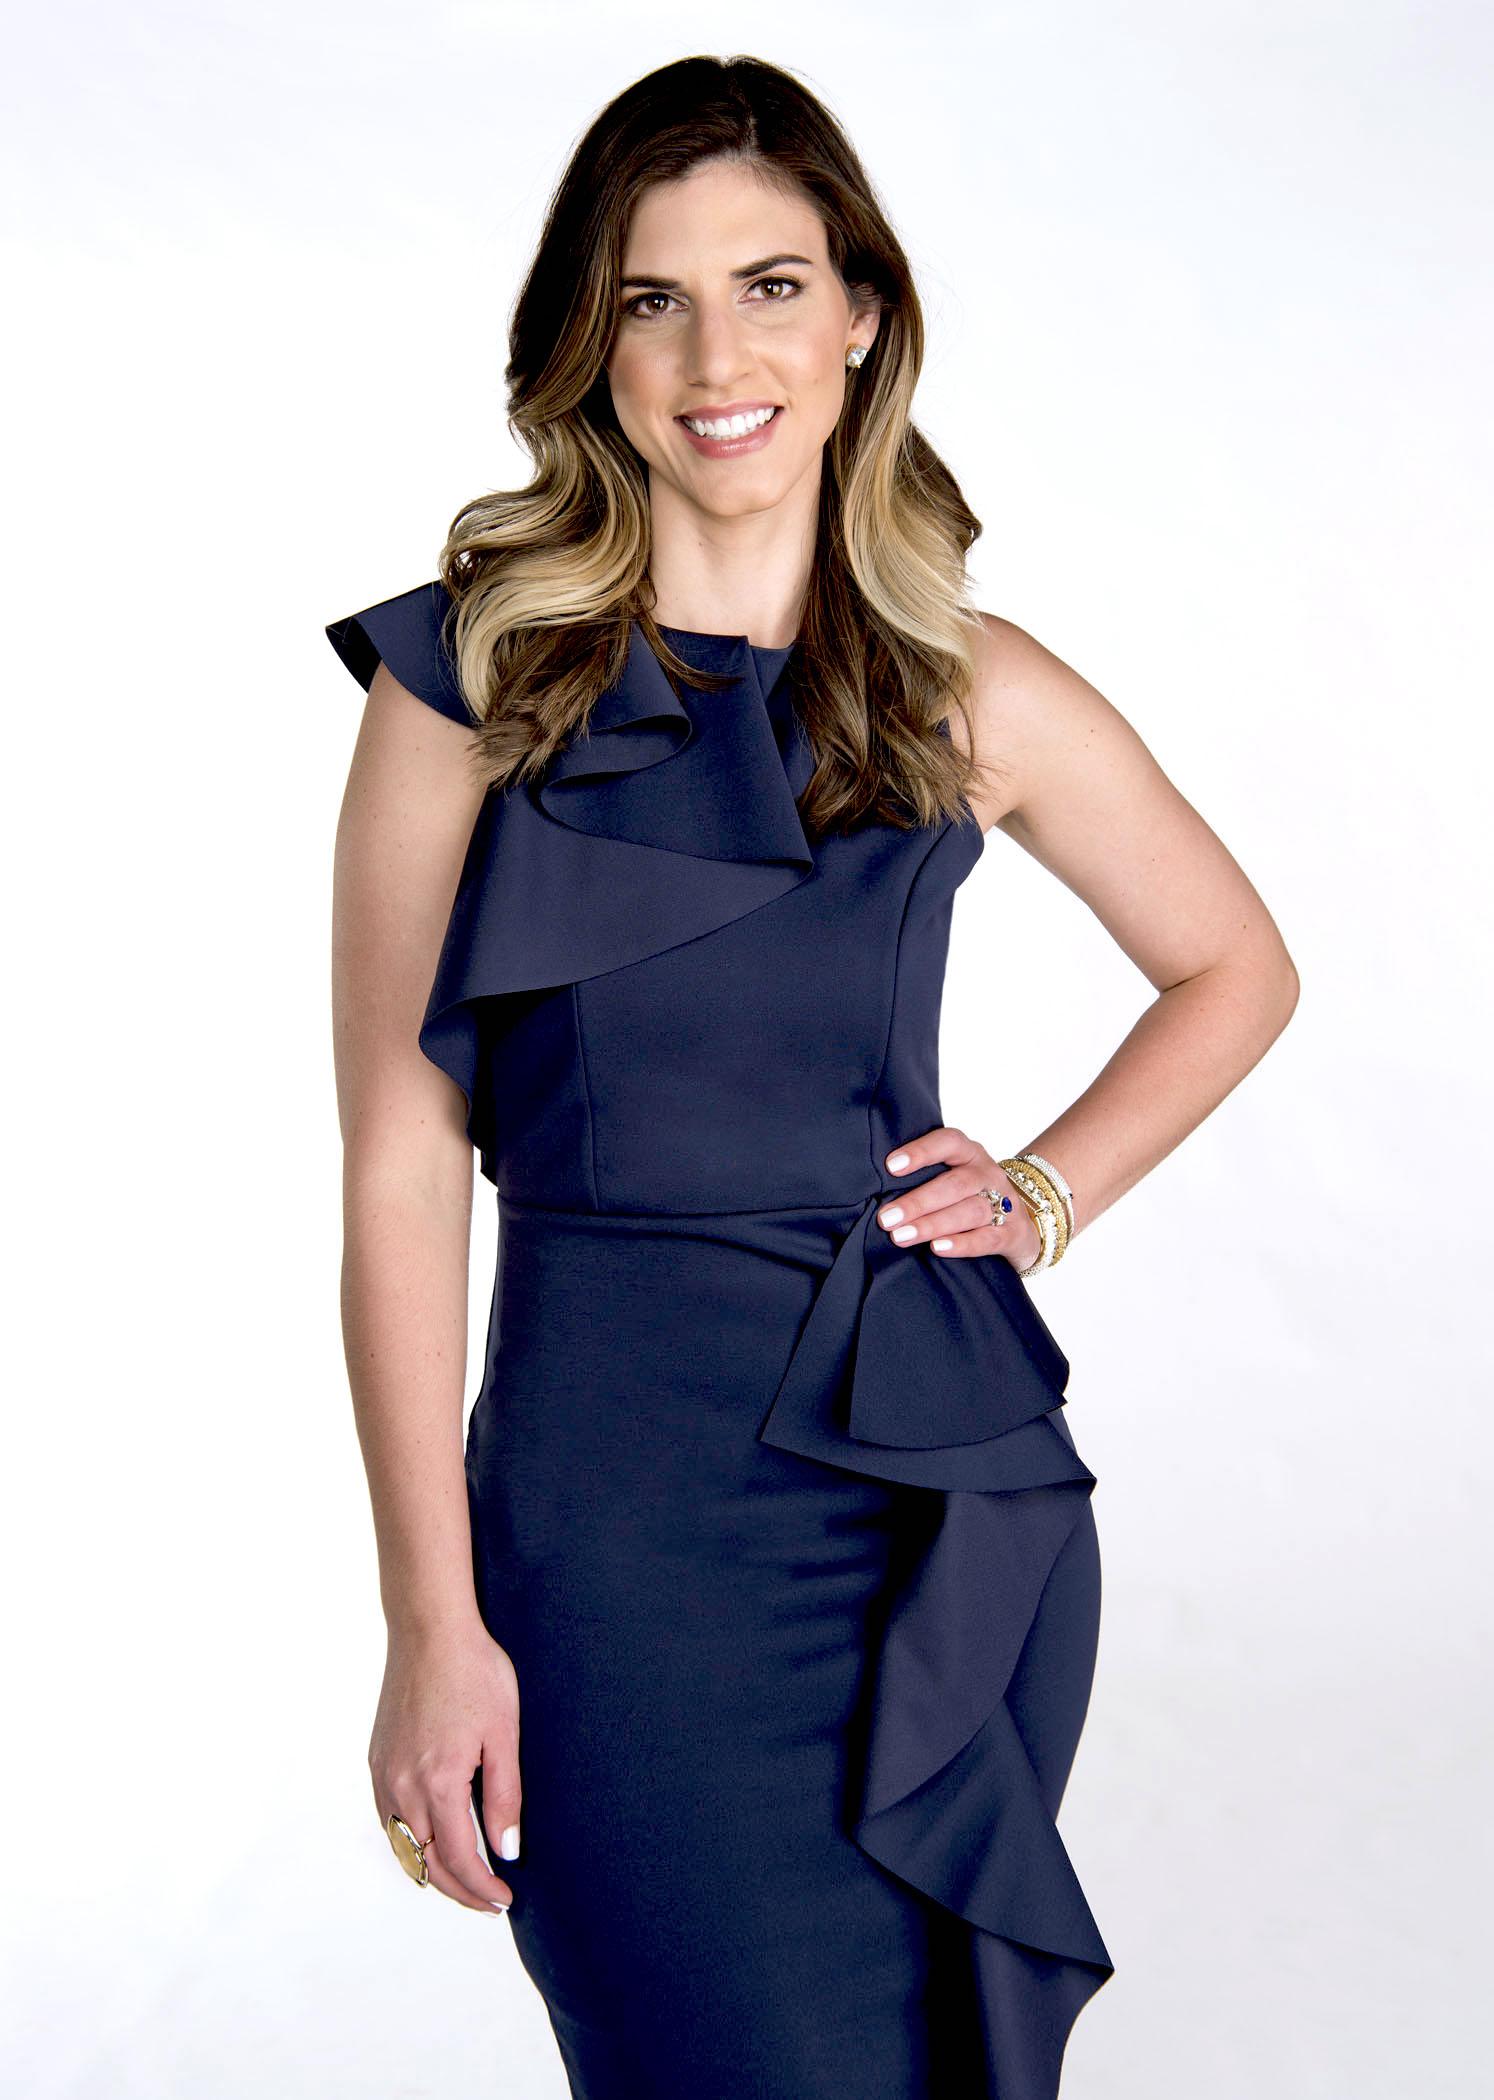 Stephanie Melish: Speaker, Author, Business Coach.